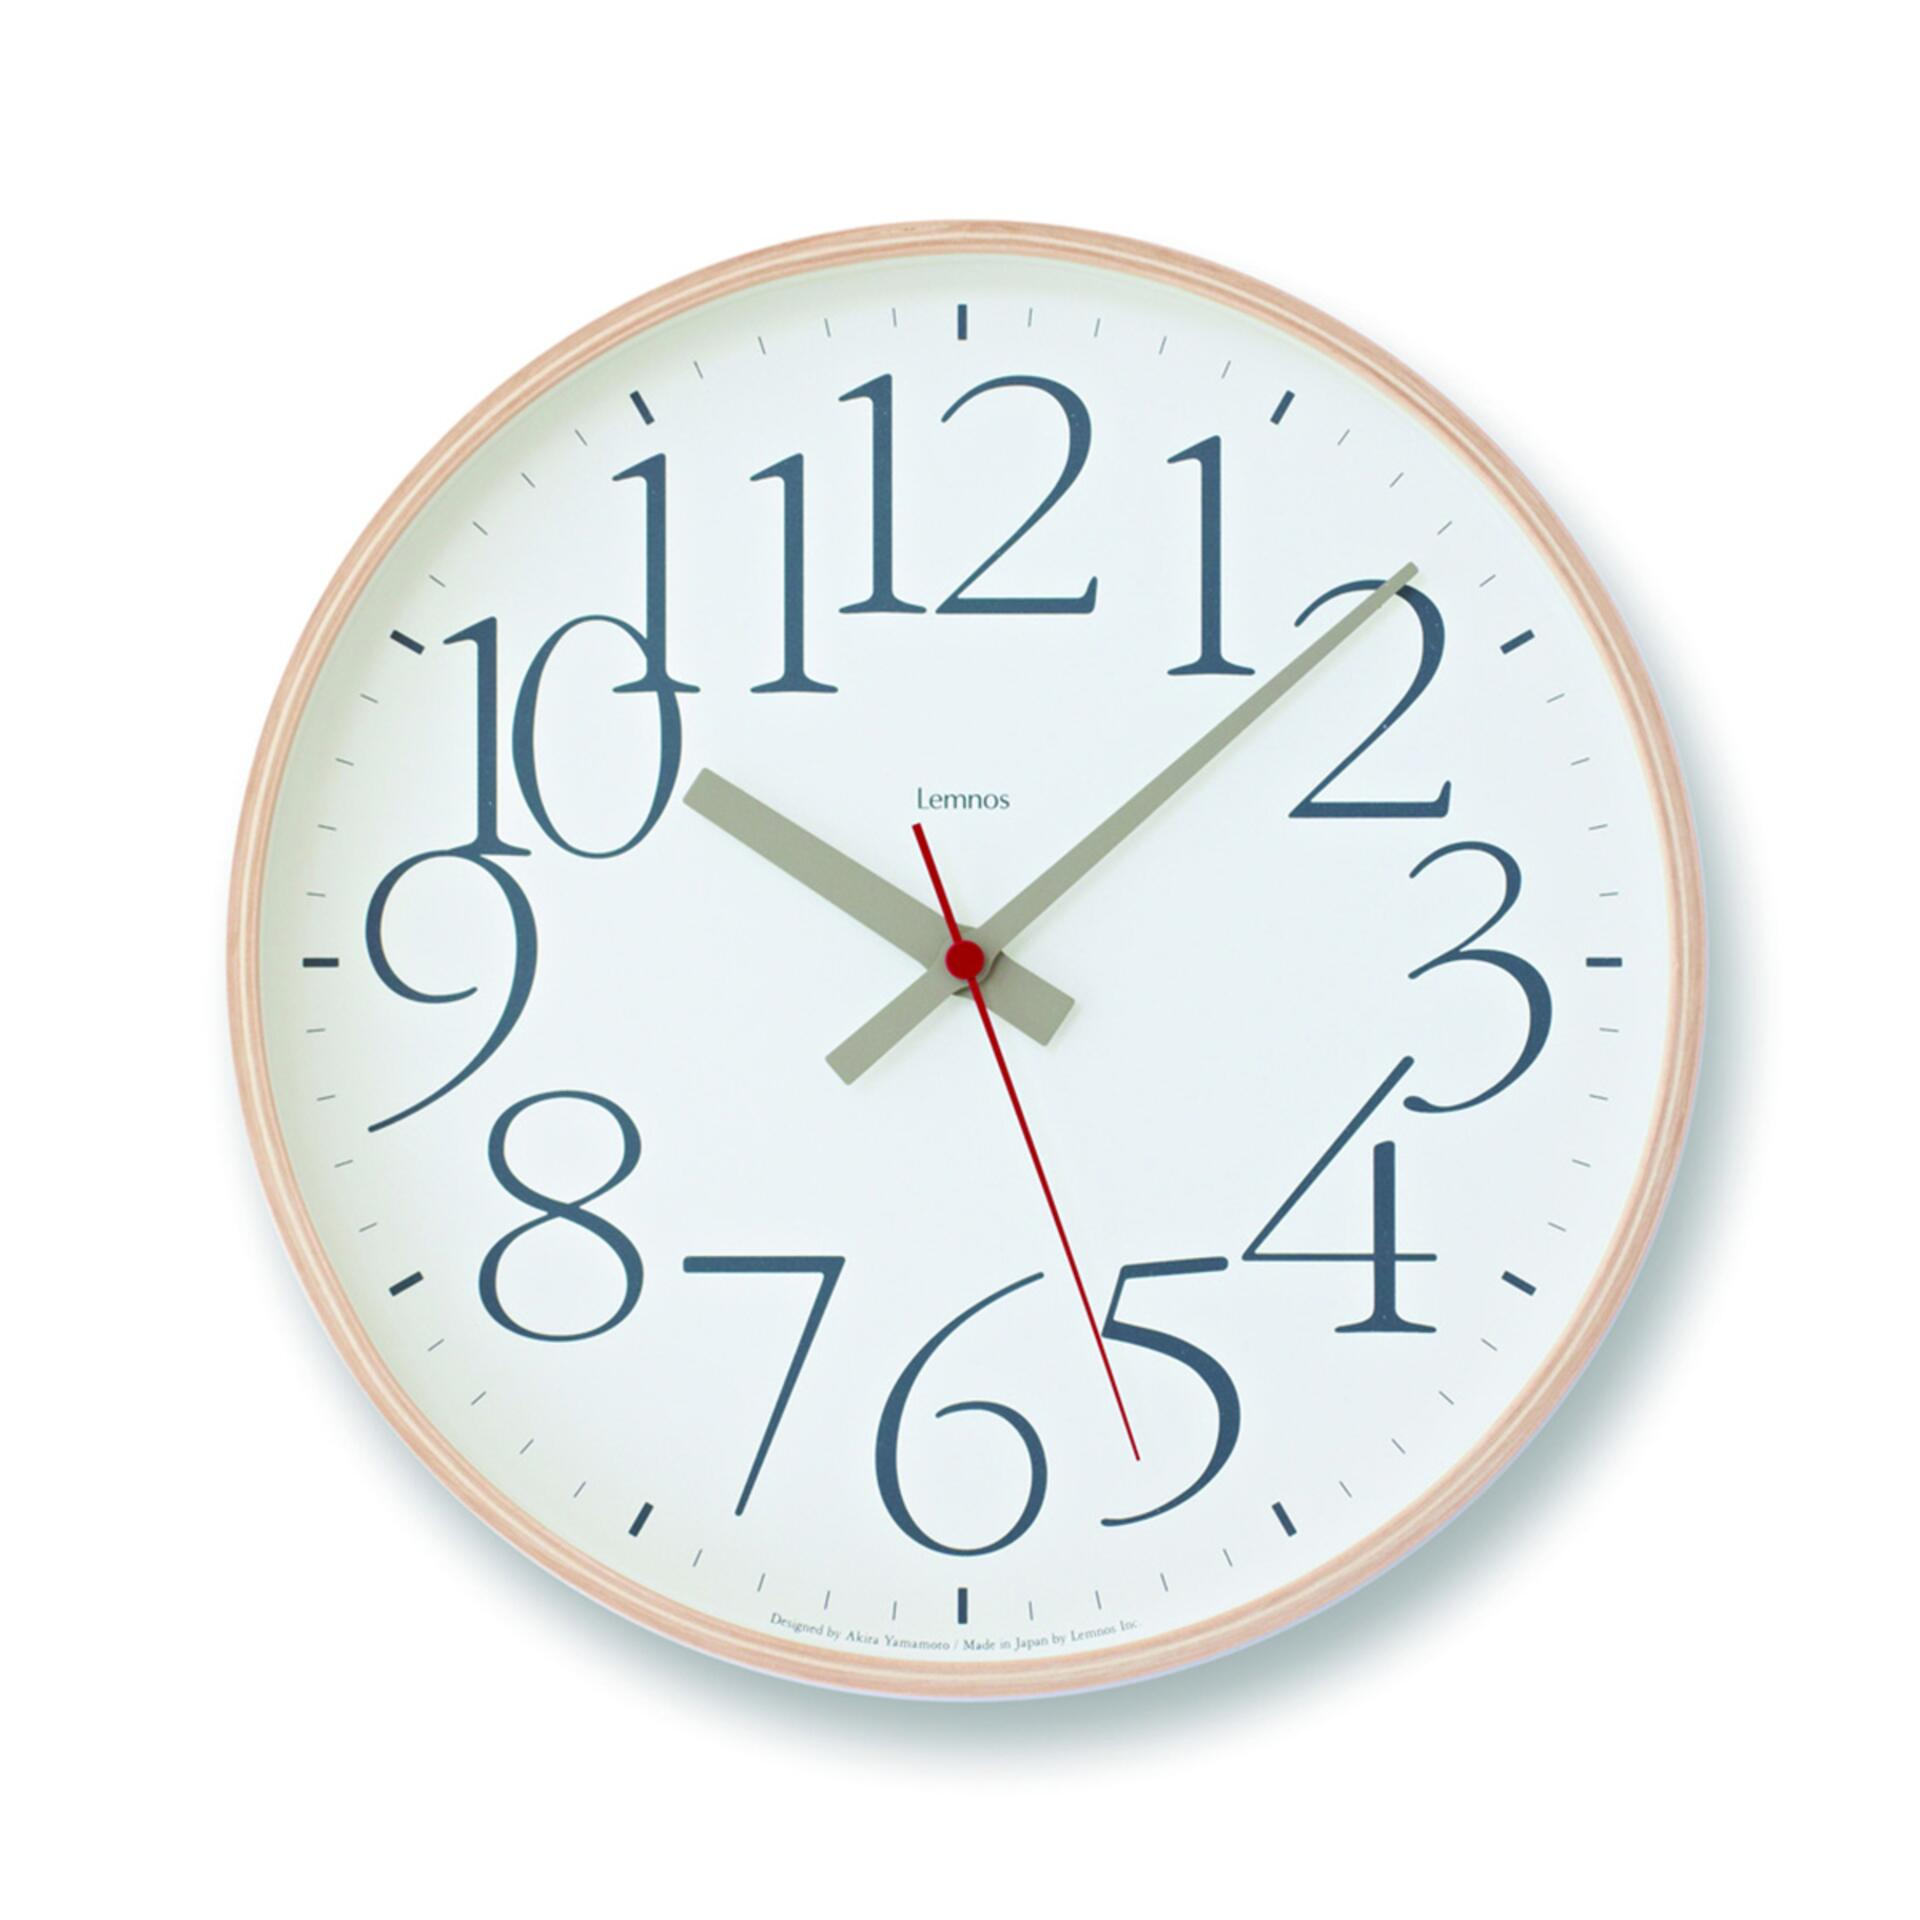 Lemnos AY Clock L Wanduhr Weiss